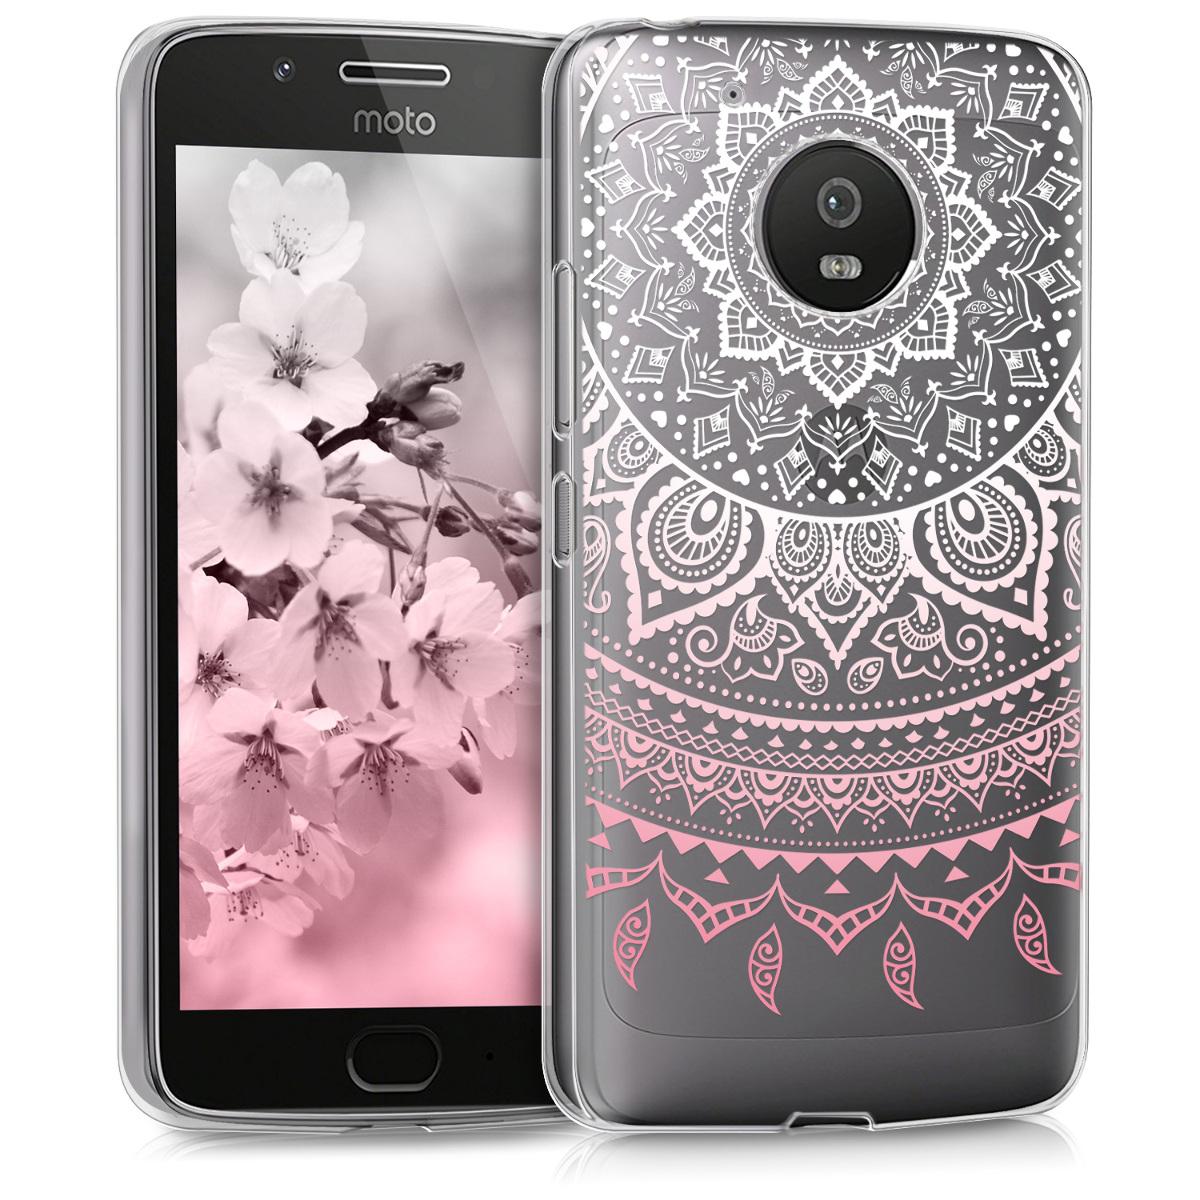 Kvalitní silikonové TPU pouzdro | obal pro Motorola Moto G5 - Indian Sun Pink / White / Transparent